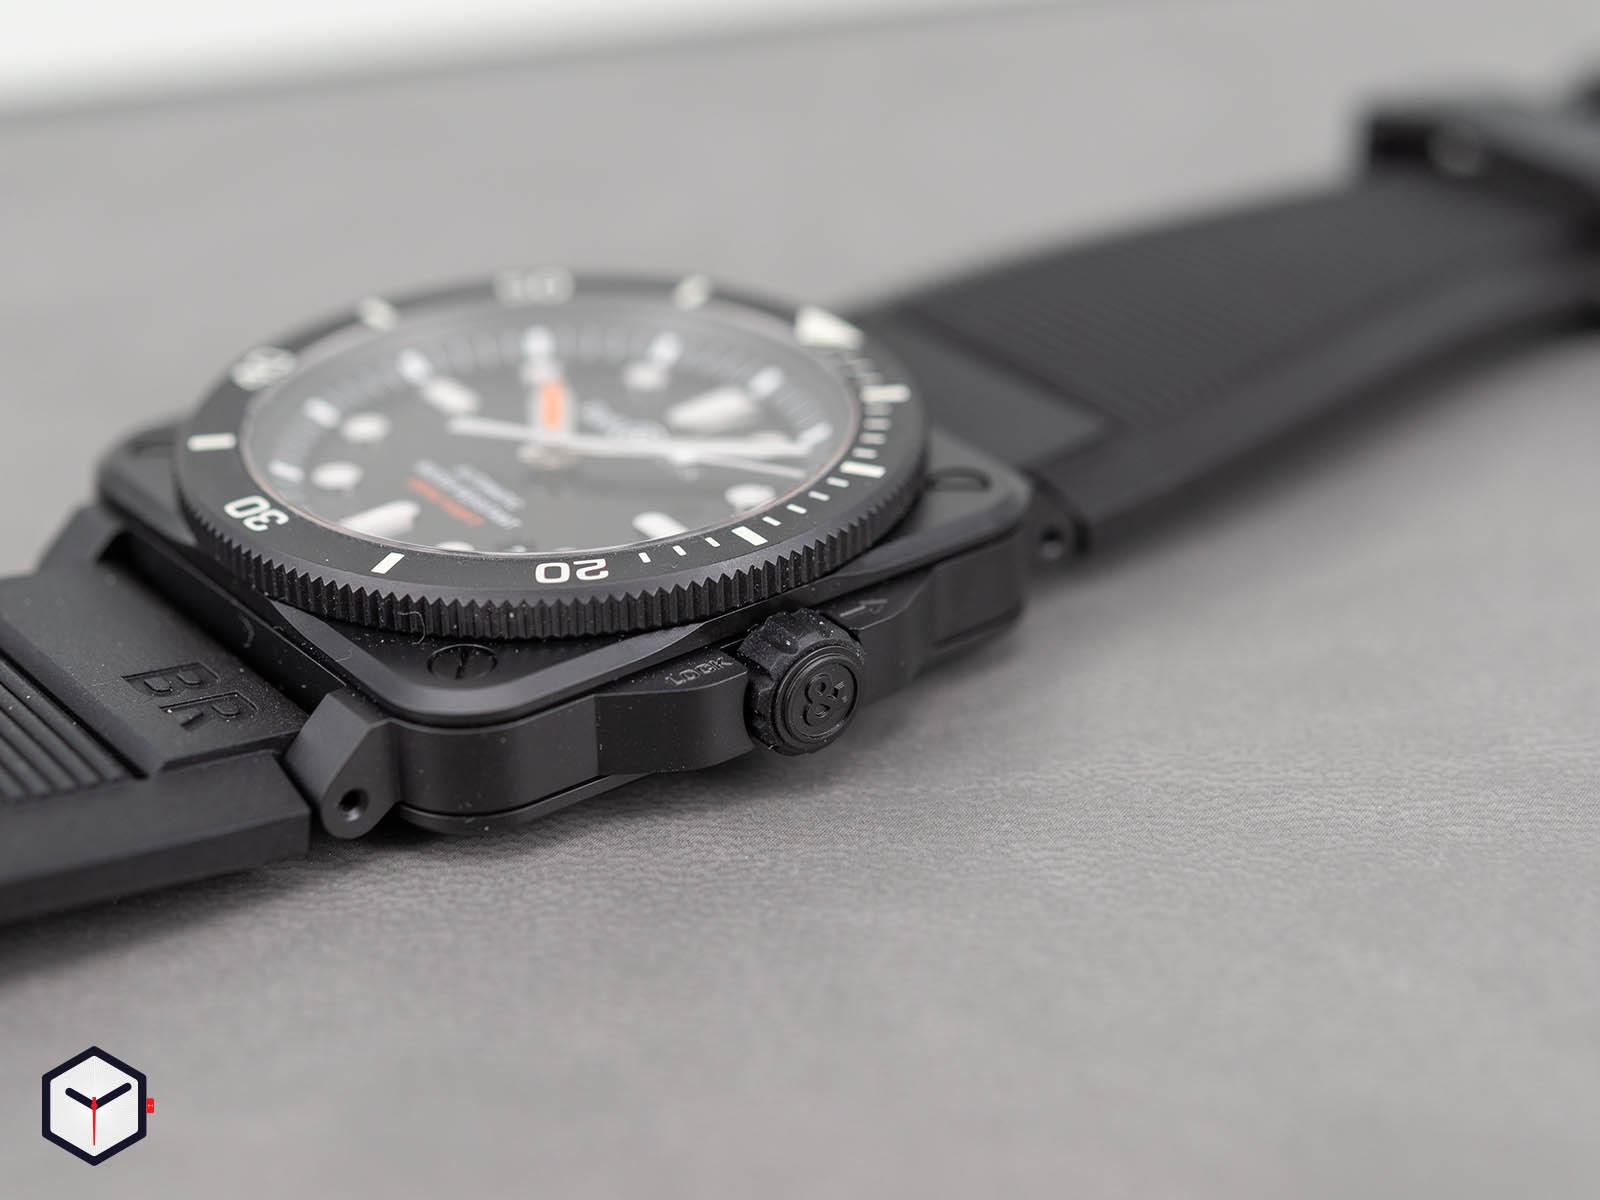 br0392-d-bl-ce-srb-bell-ross-br-03-92-diver-black-matte-5.jpg